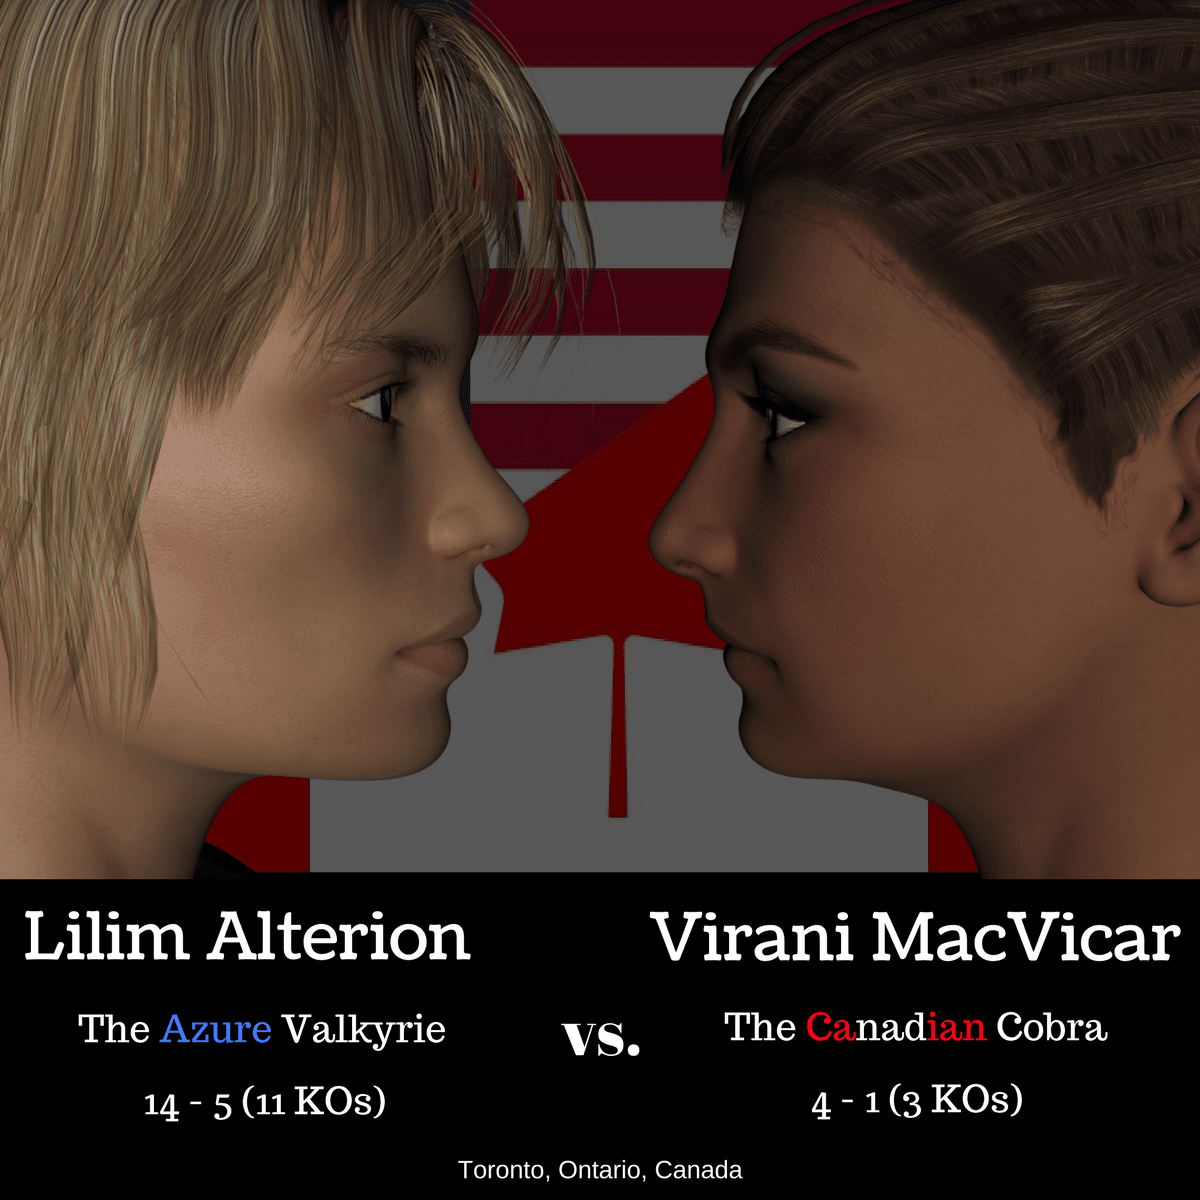 Virani v. Lilim - The Fight Poster